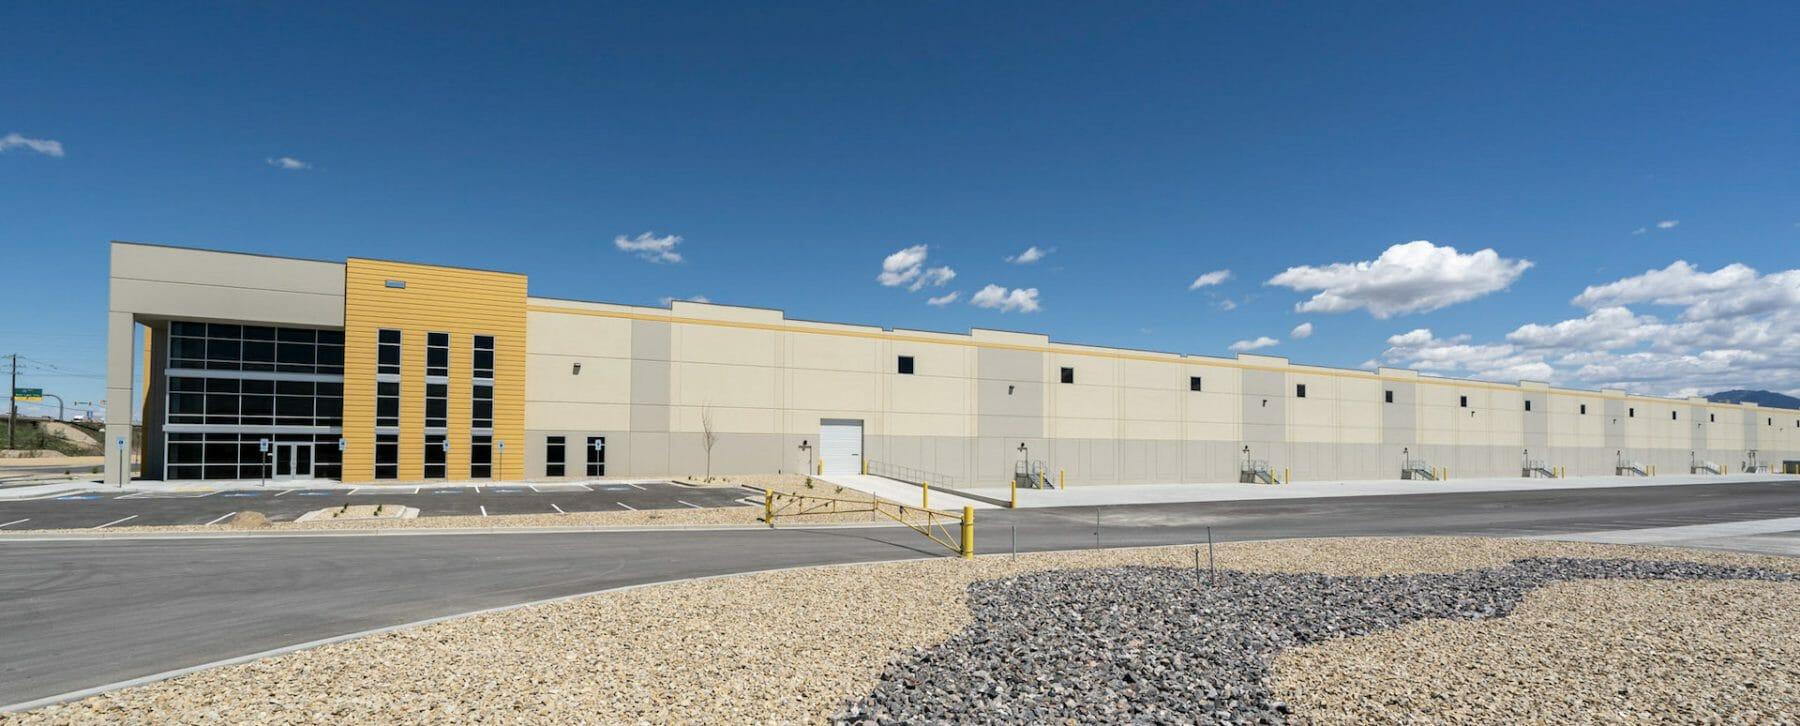 Summit Logistics Center - Salt Lake City, UT 3